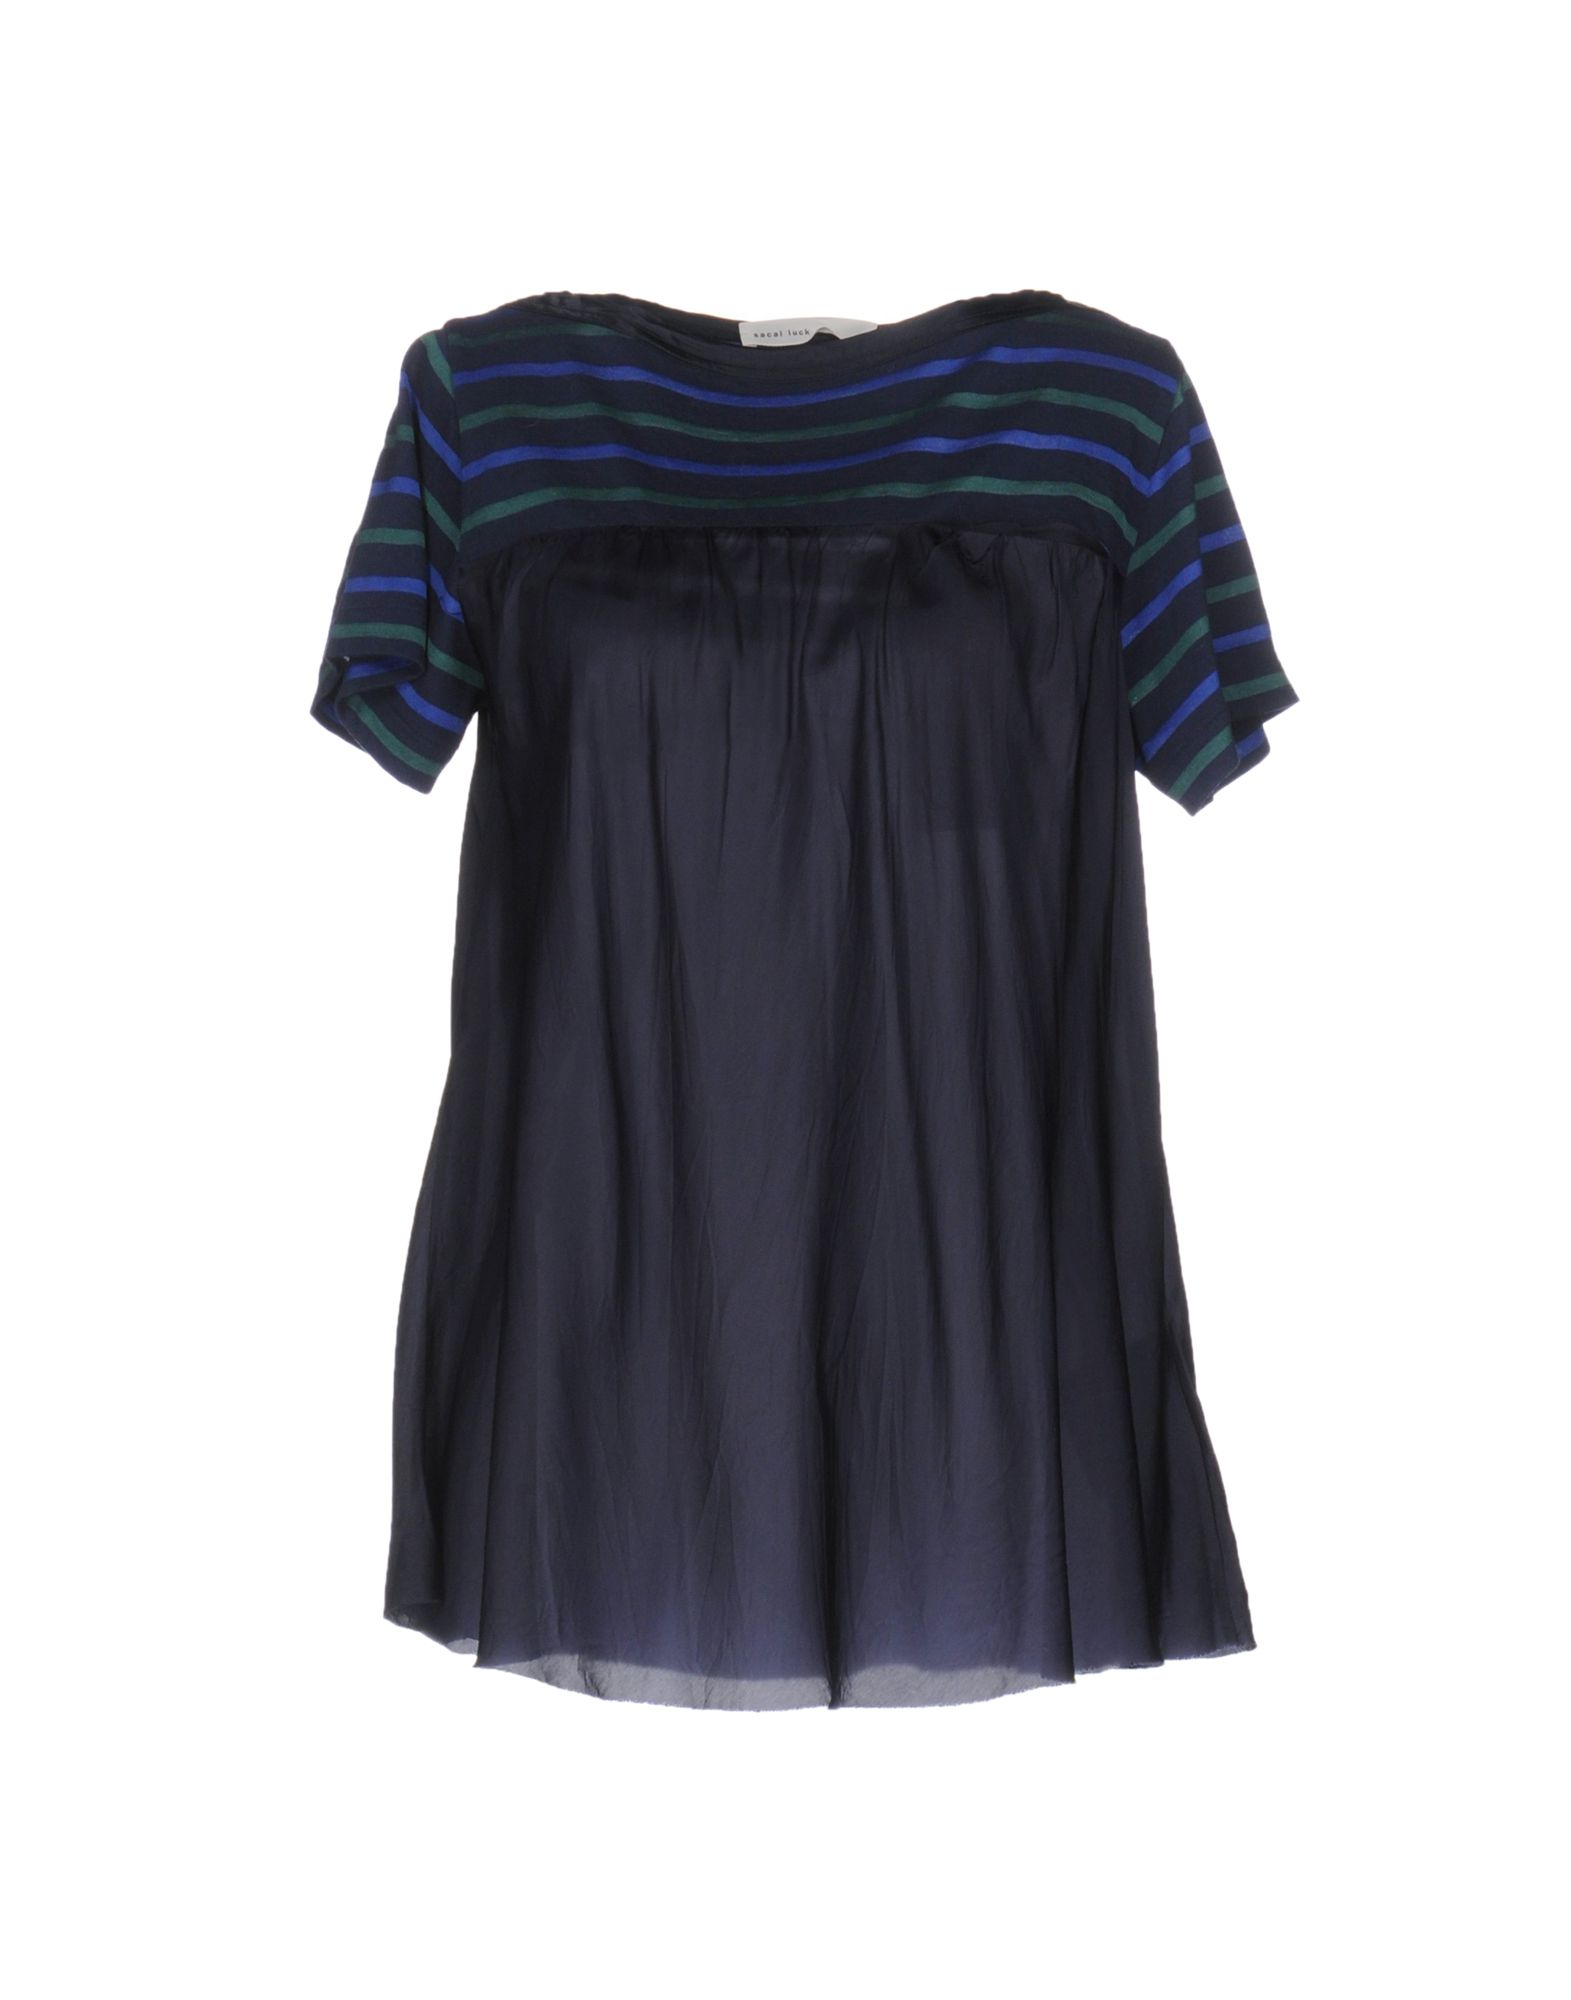 SACAI LUCK Damen Bluse Farbe Dunkelblau Größe 4 - broschei